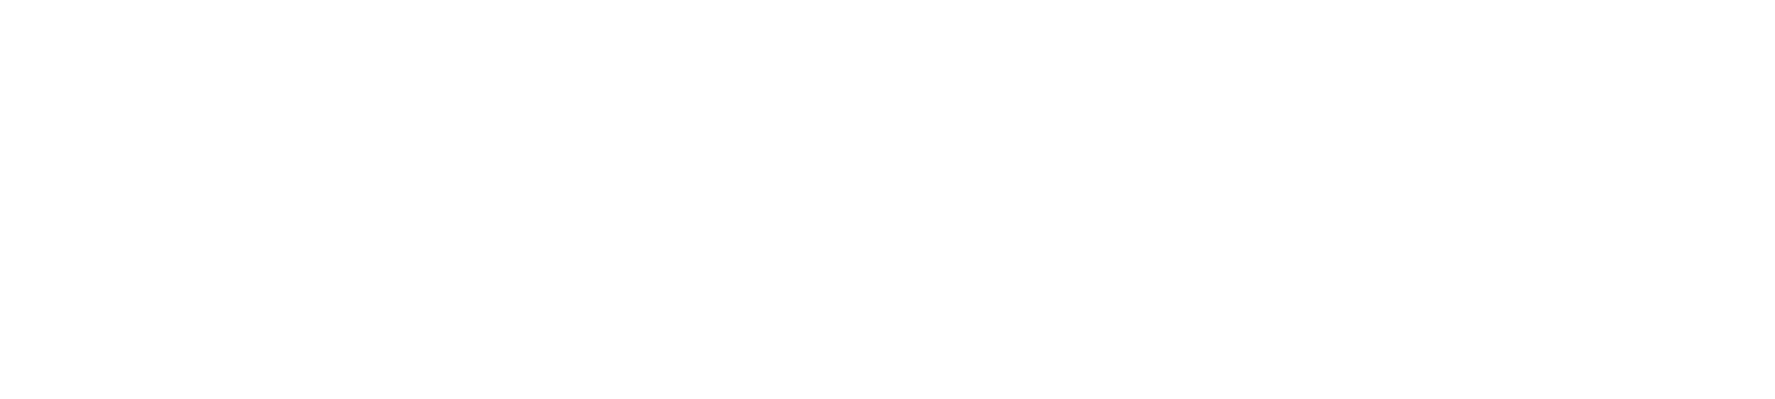 kicker-logo-white-on-trans